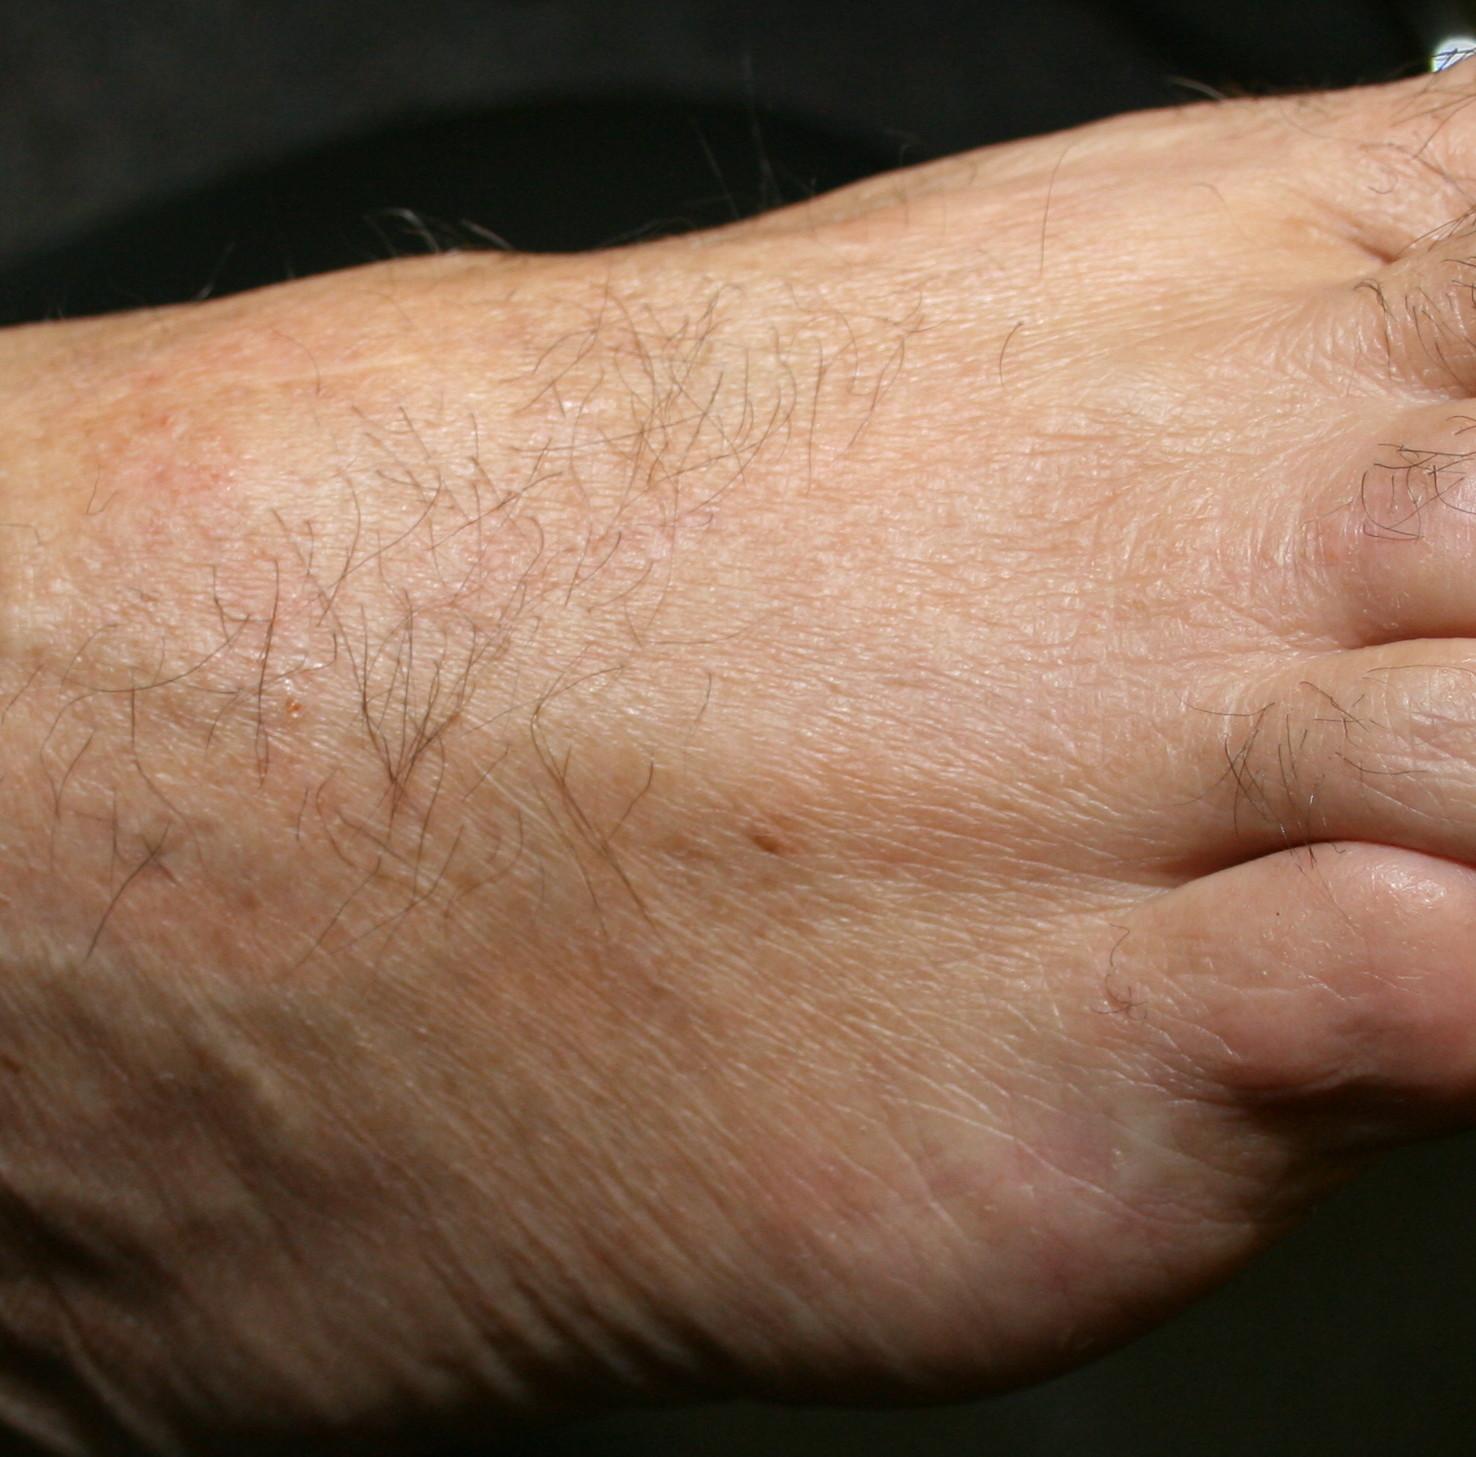 Fungal disease – Tinea | Dr. Erikson